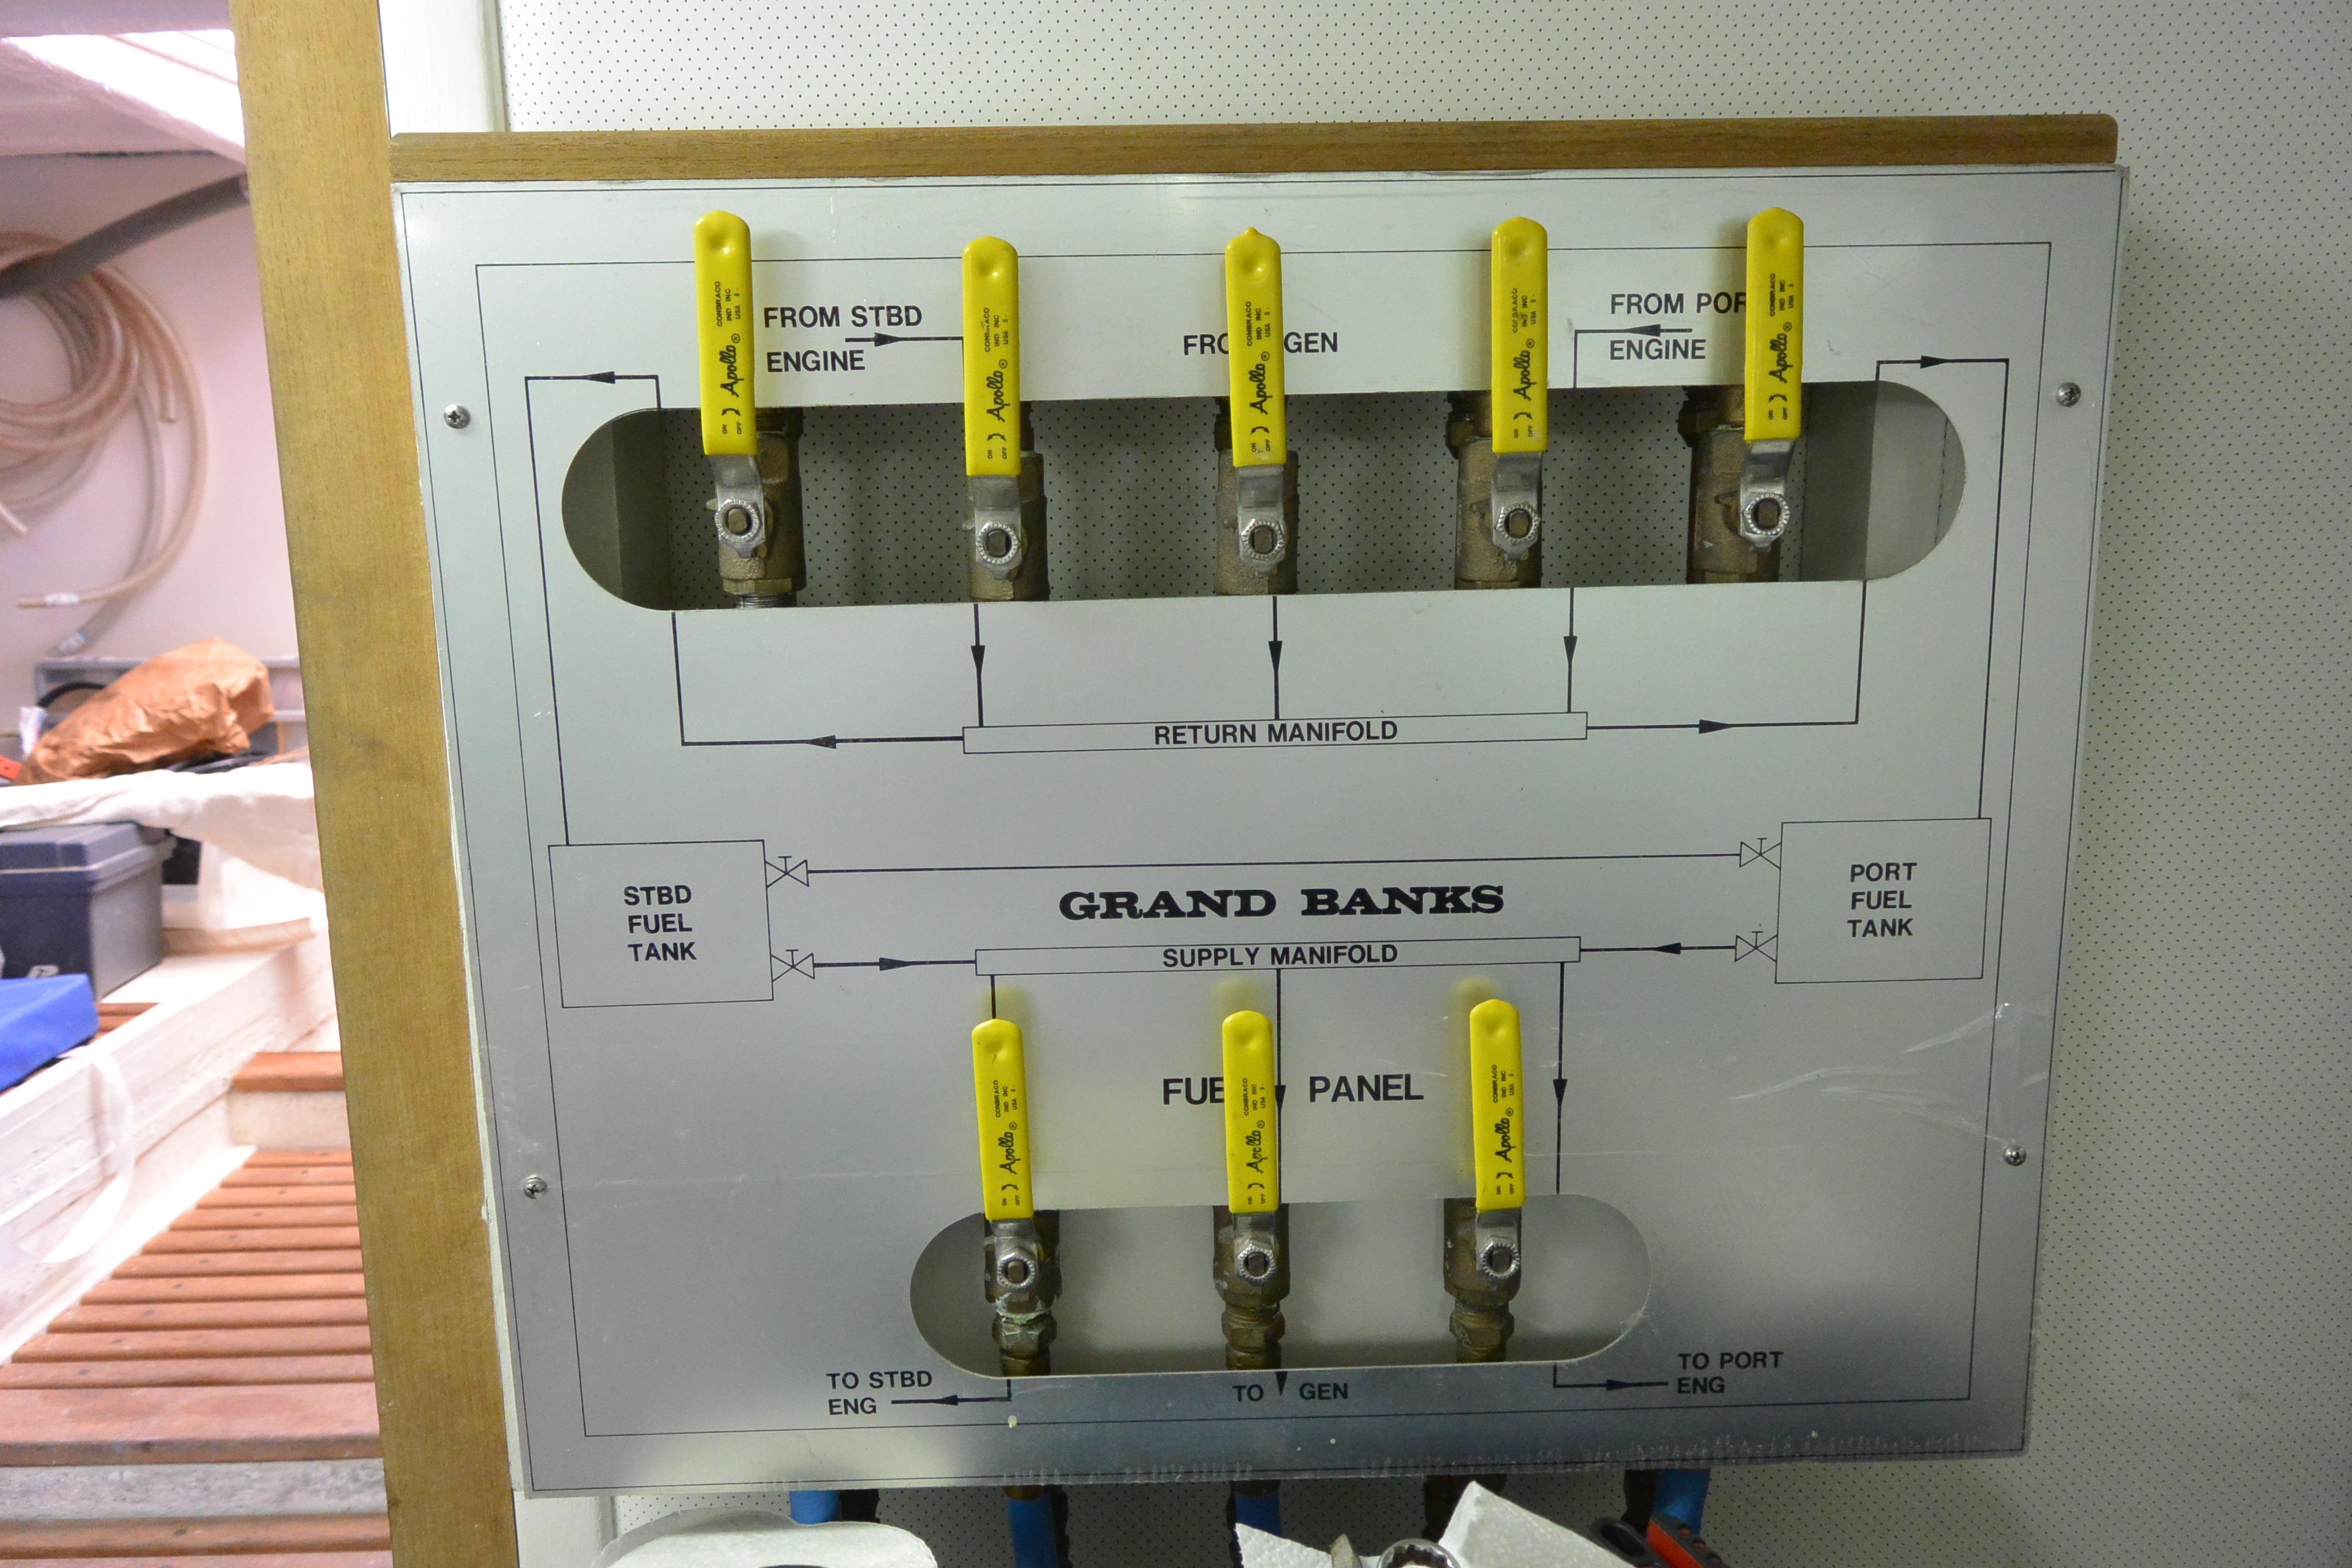 Engine room fuel controls